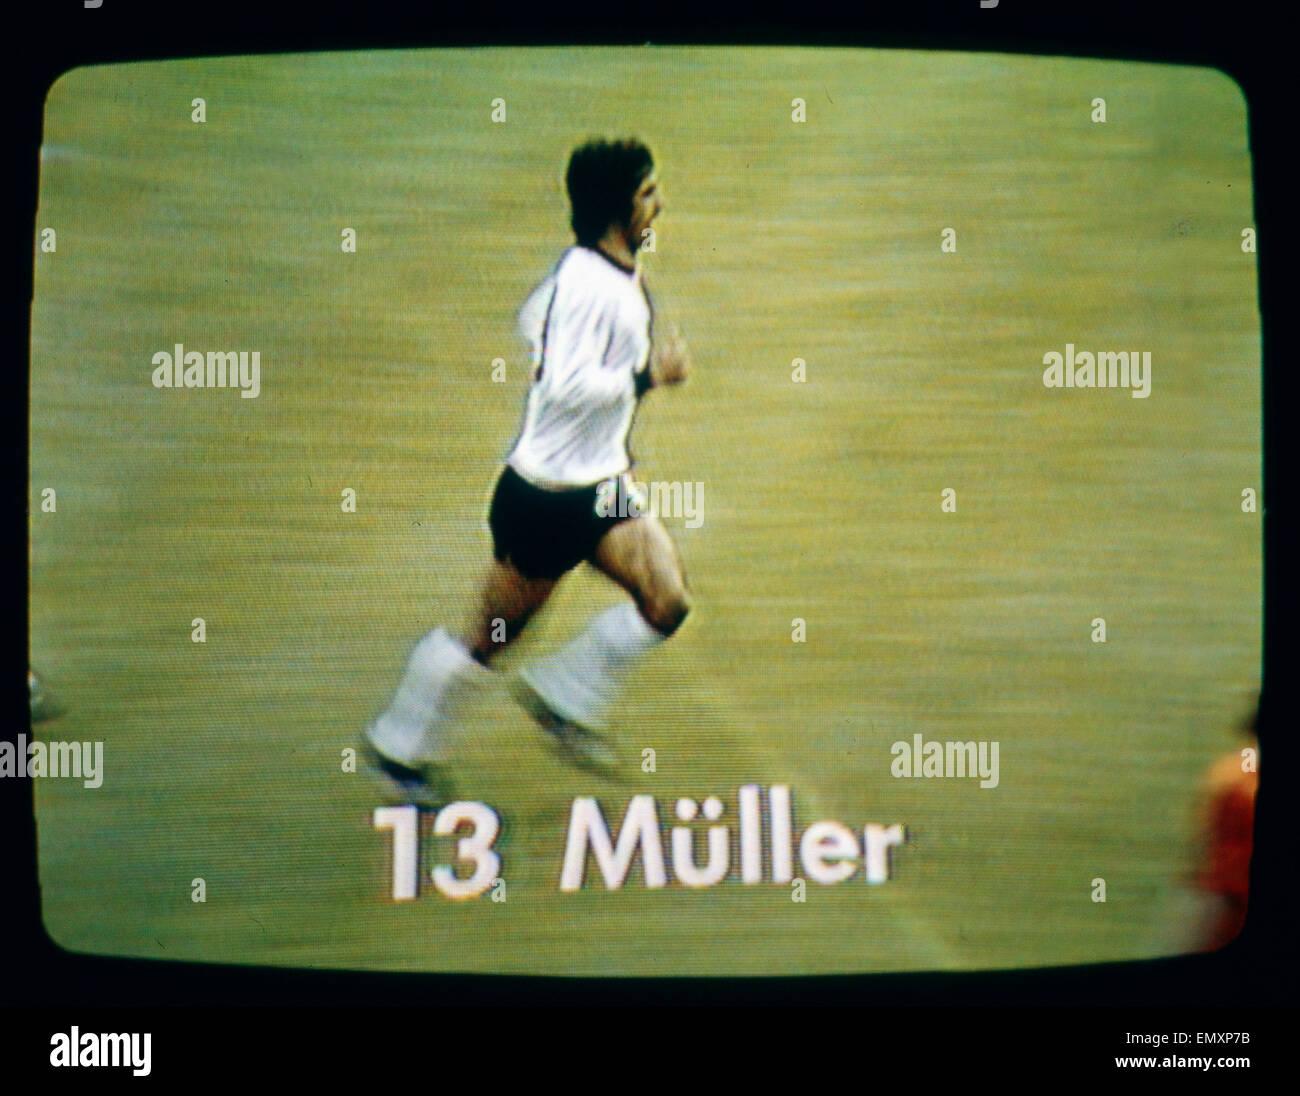 Bayern Munich Gerd Müller Stock Photos & Bayern Munich Gerd Müller ...